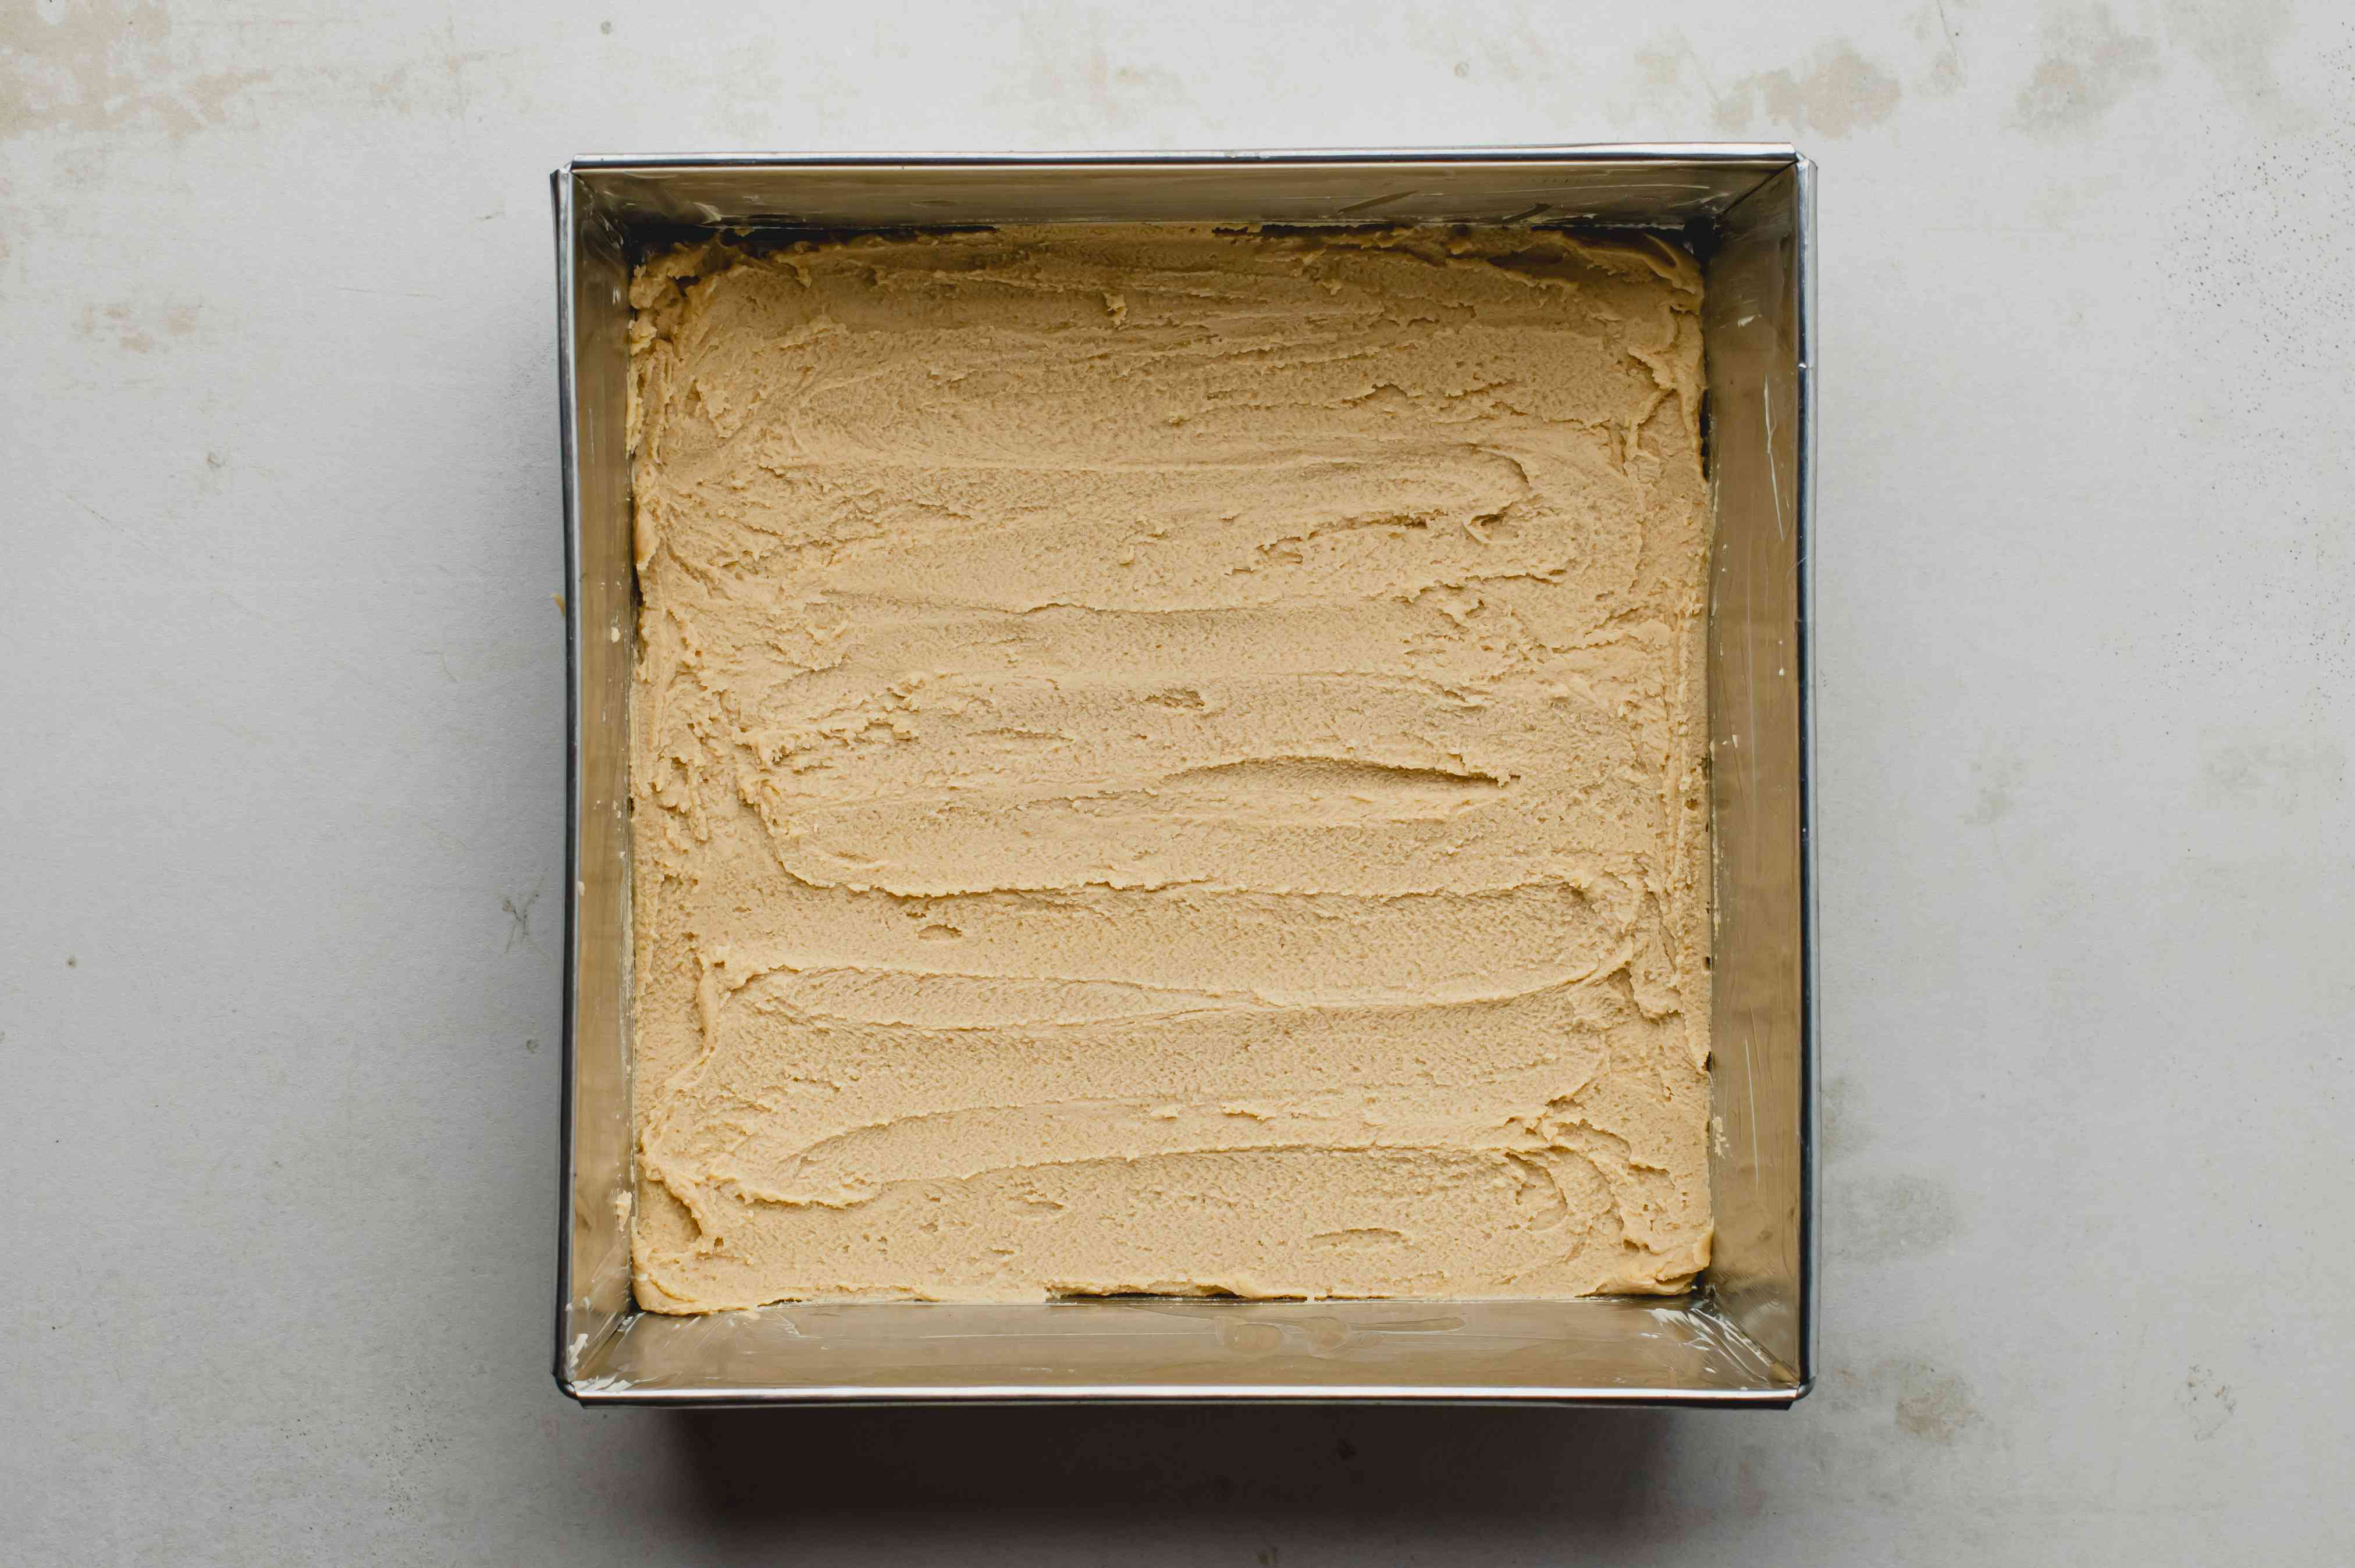 Pat shortbread dough